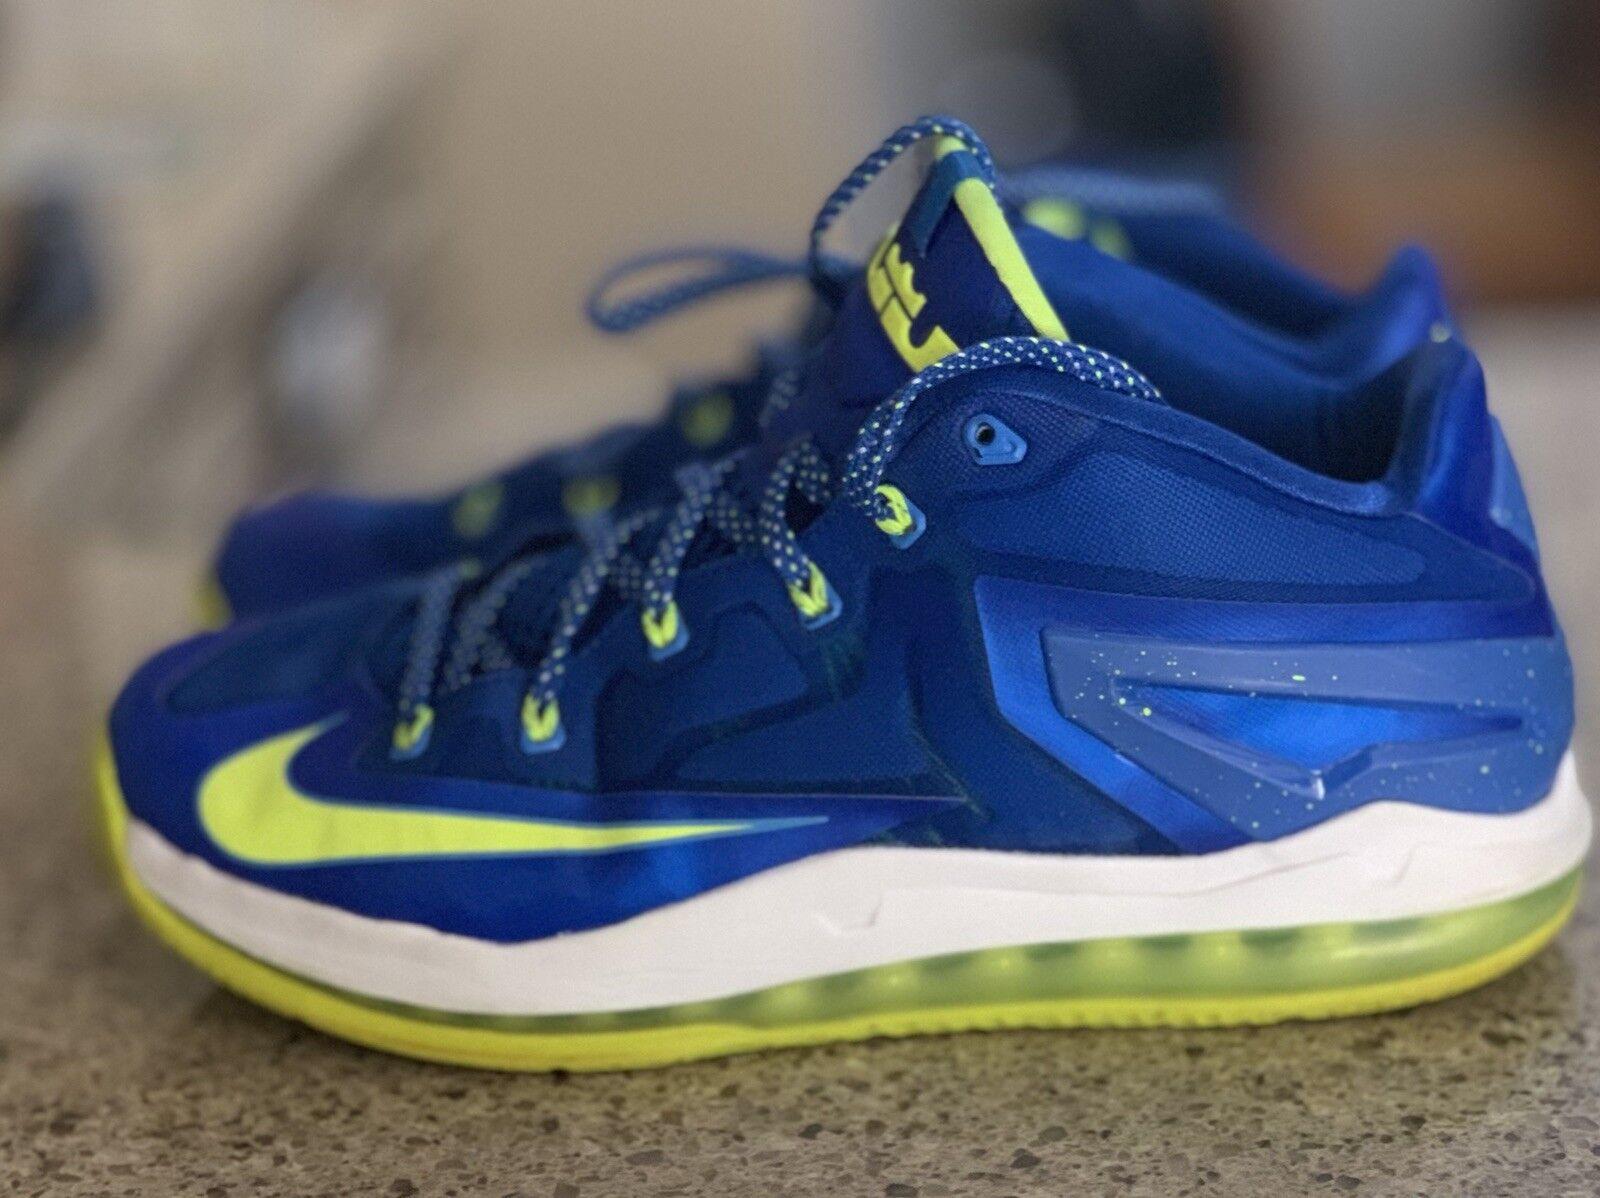 Nike Air Max Lebron XI 11 Low Size 11.5 SPRITE